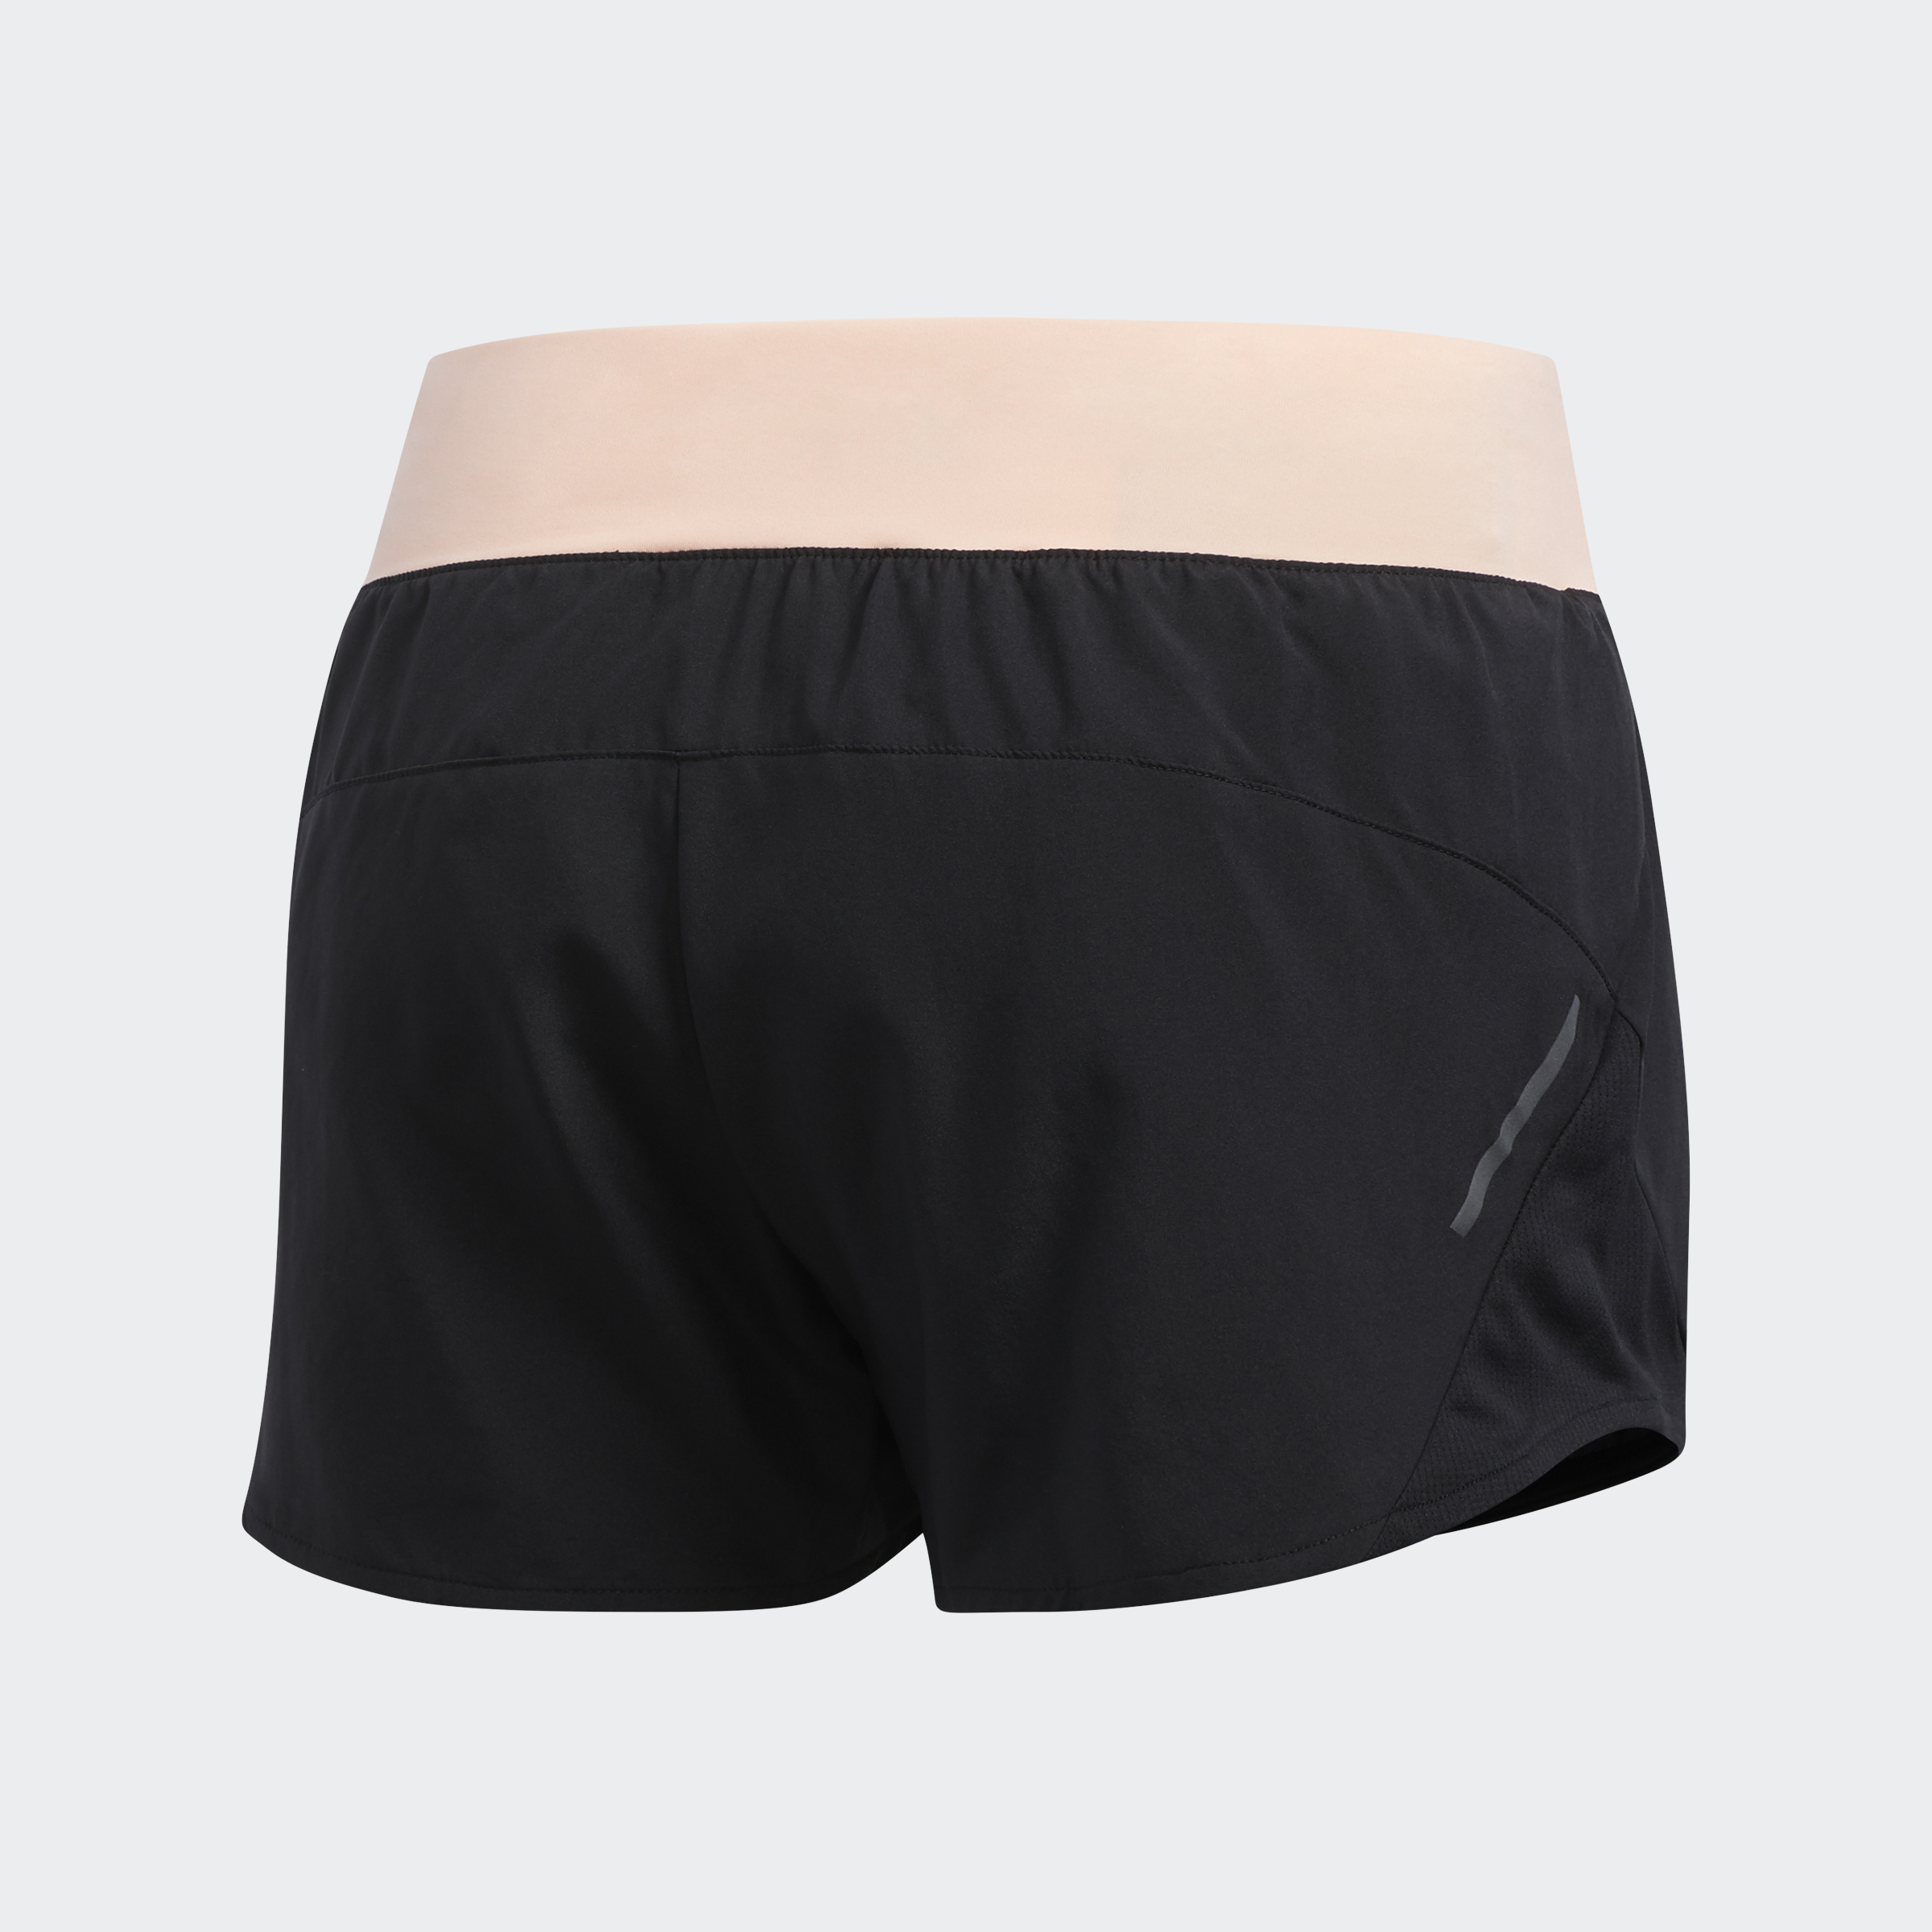 adidas-Run-It-Shorts-Women-039-s-Shorts thumbnail 25